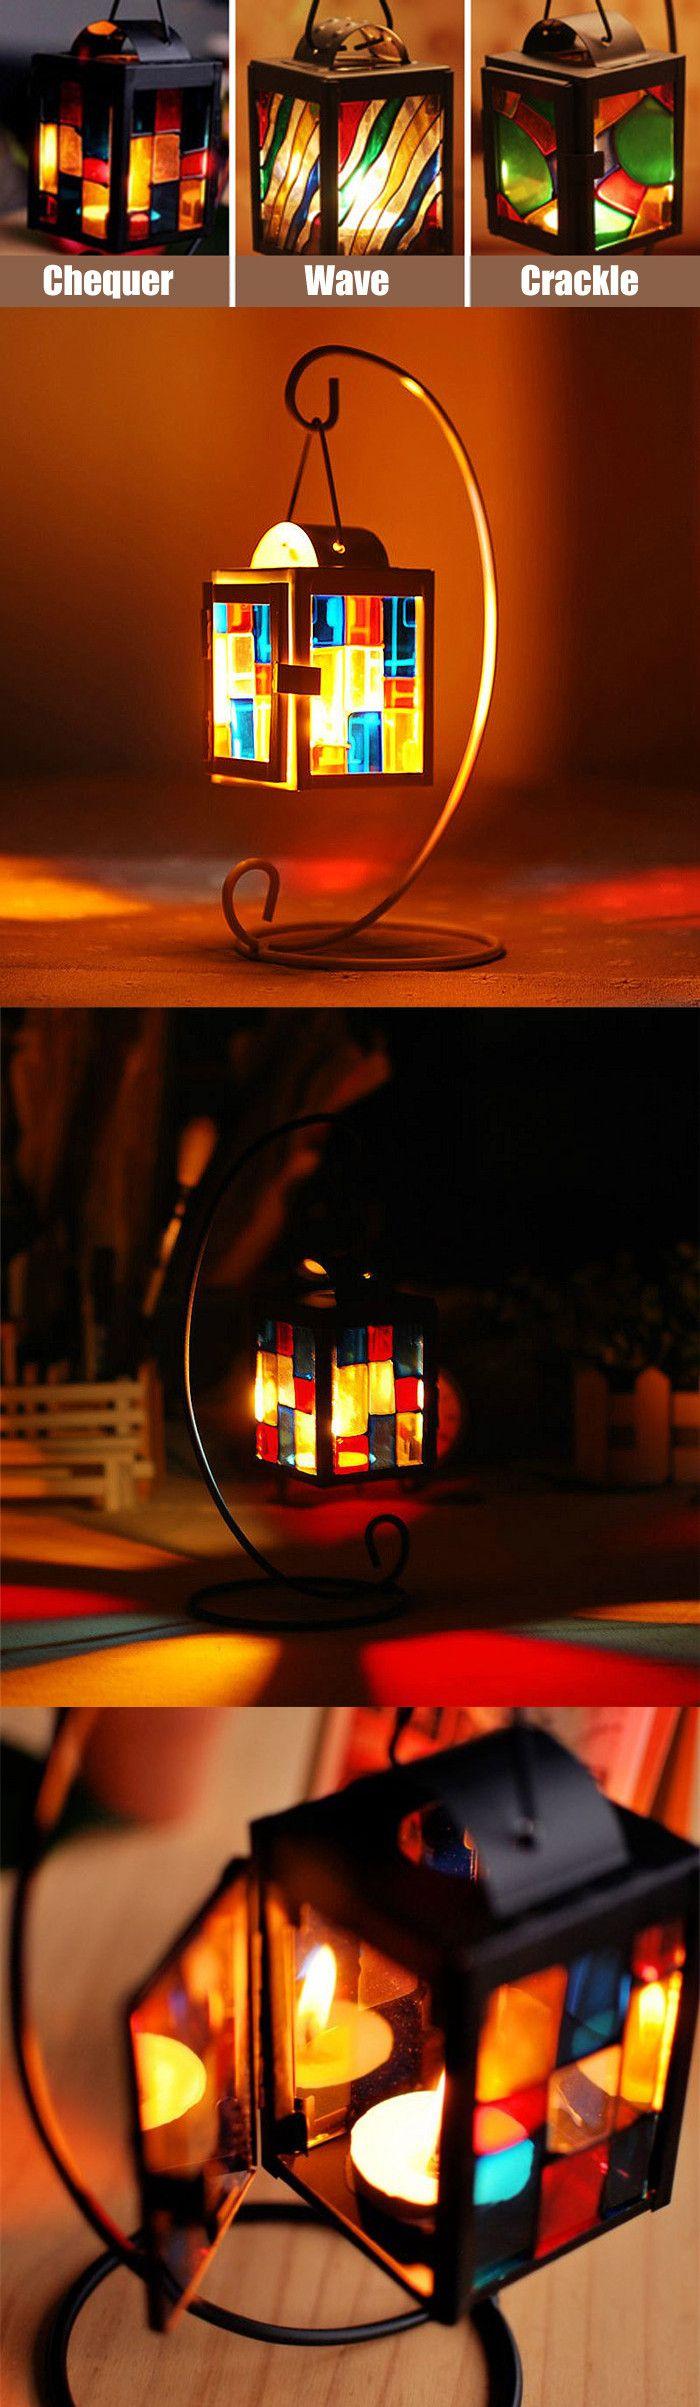 Retro Iron Candlestick Lantern Tea Light Holder Home Shop Ornaments